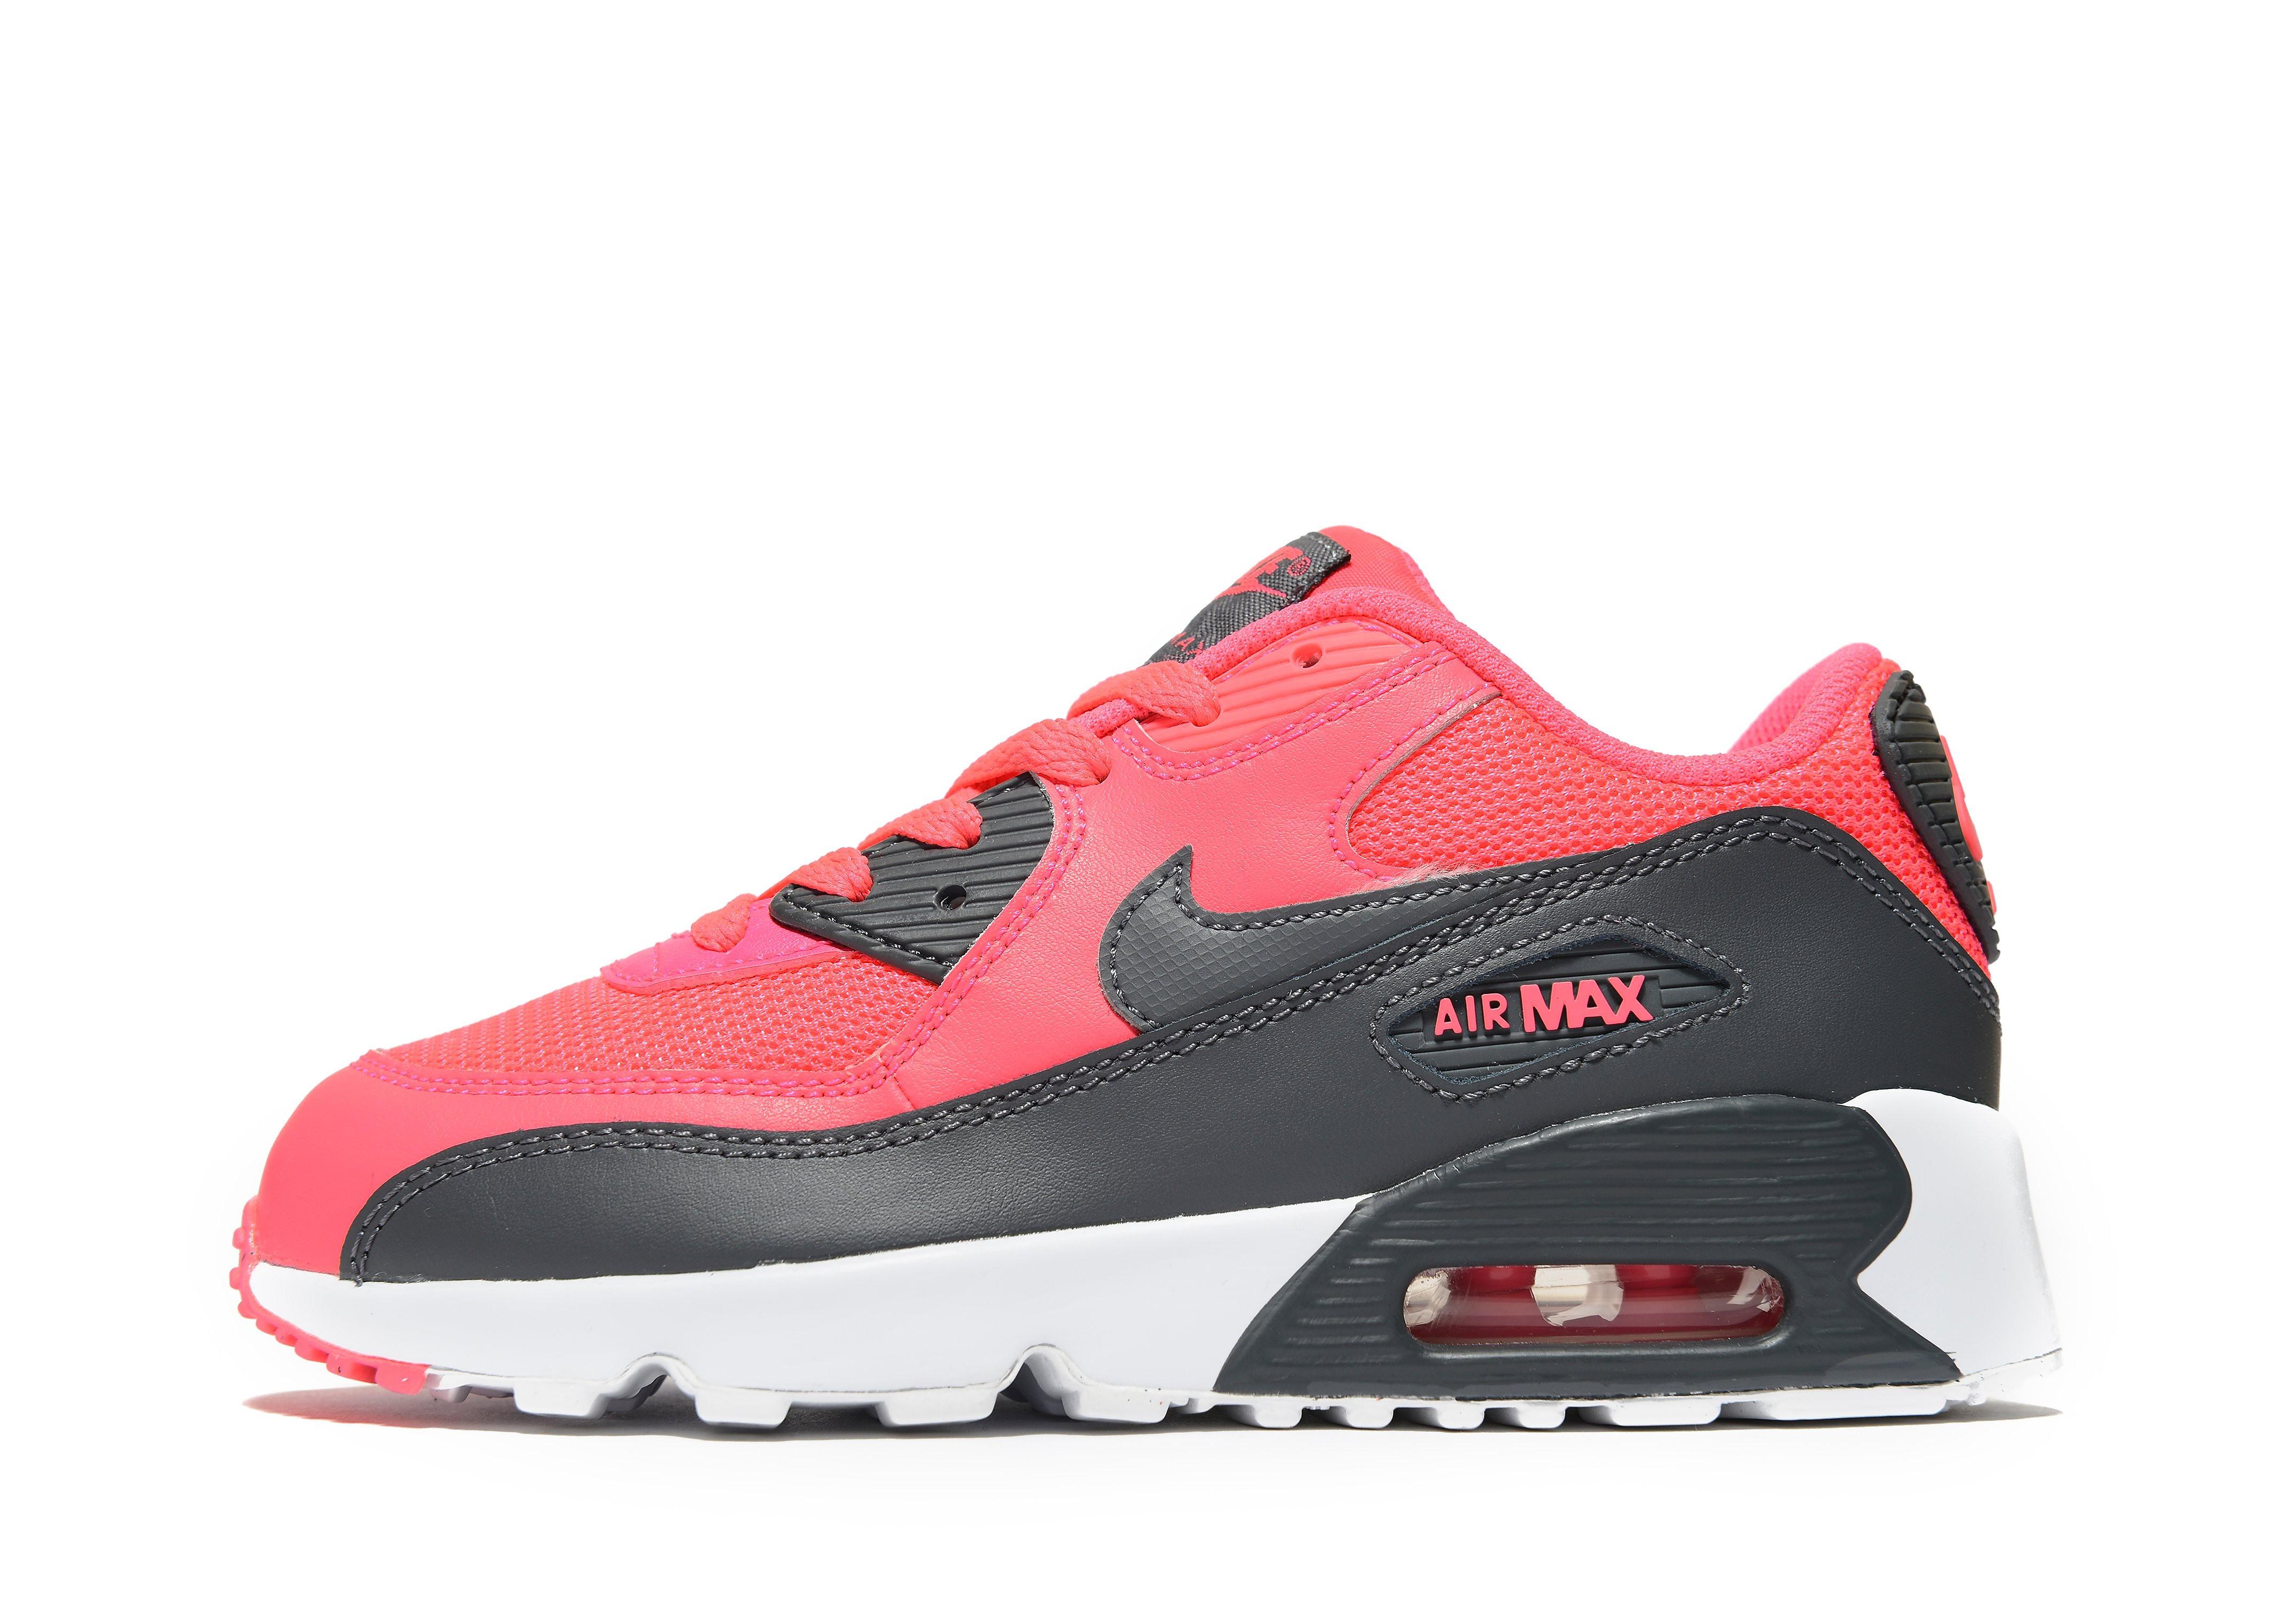 Nike Air Max 90 Enfant